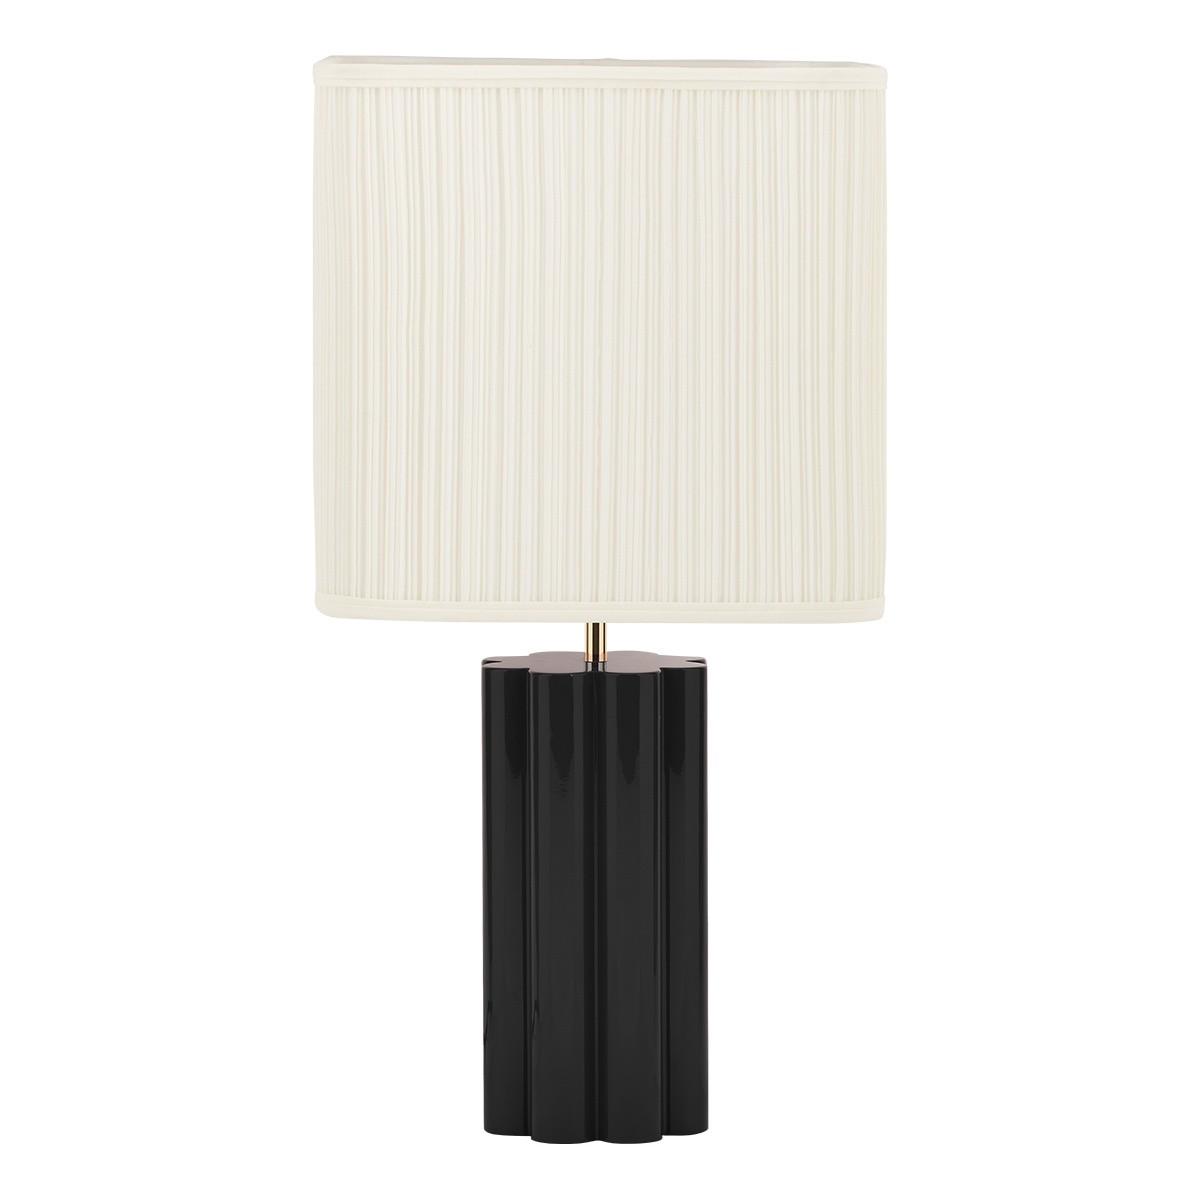 Gioia Table Lamp, Black